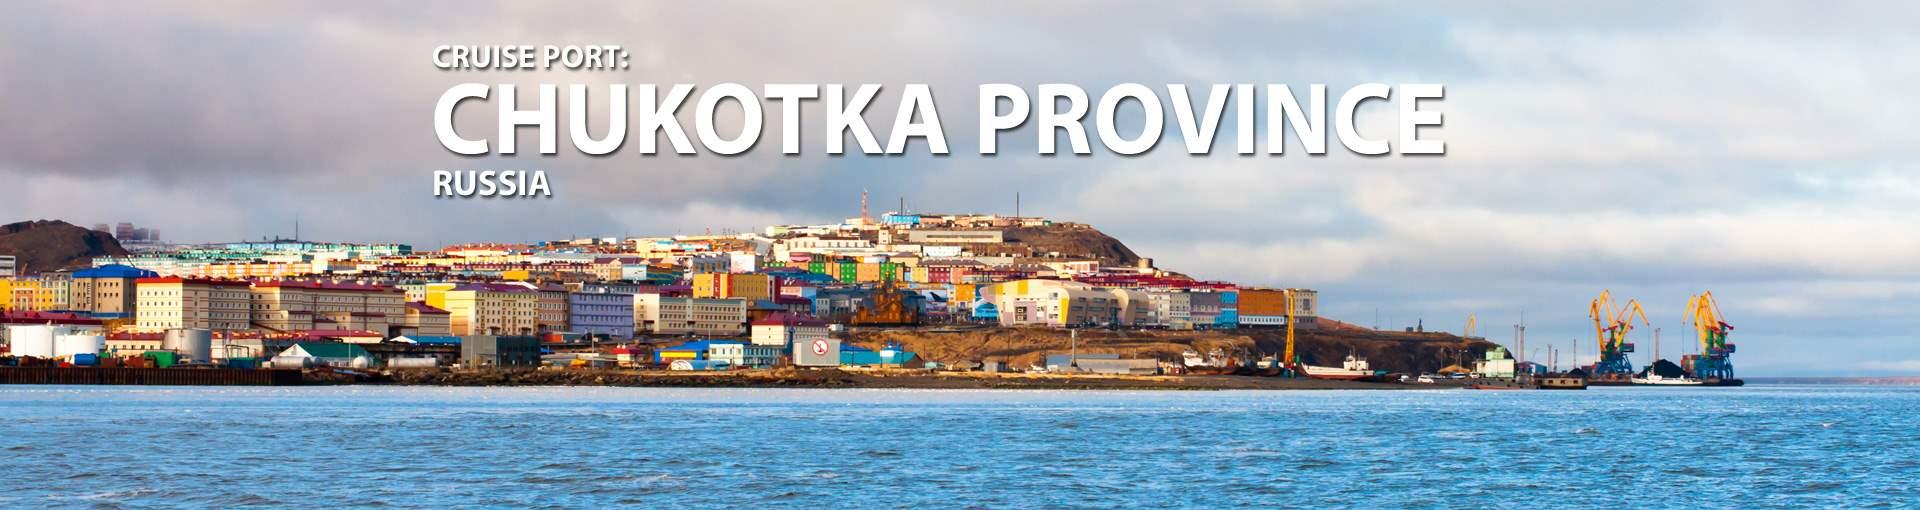 Cruises to Chukotka Province, Russia